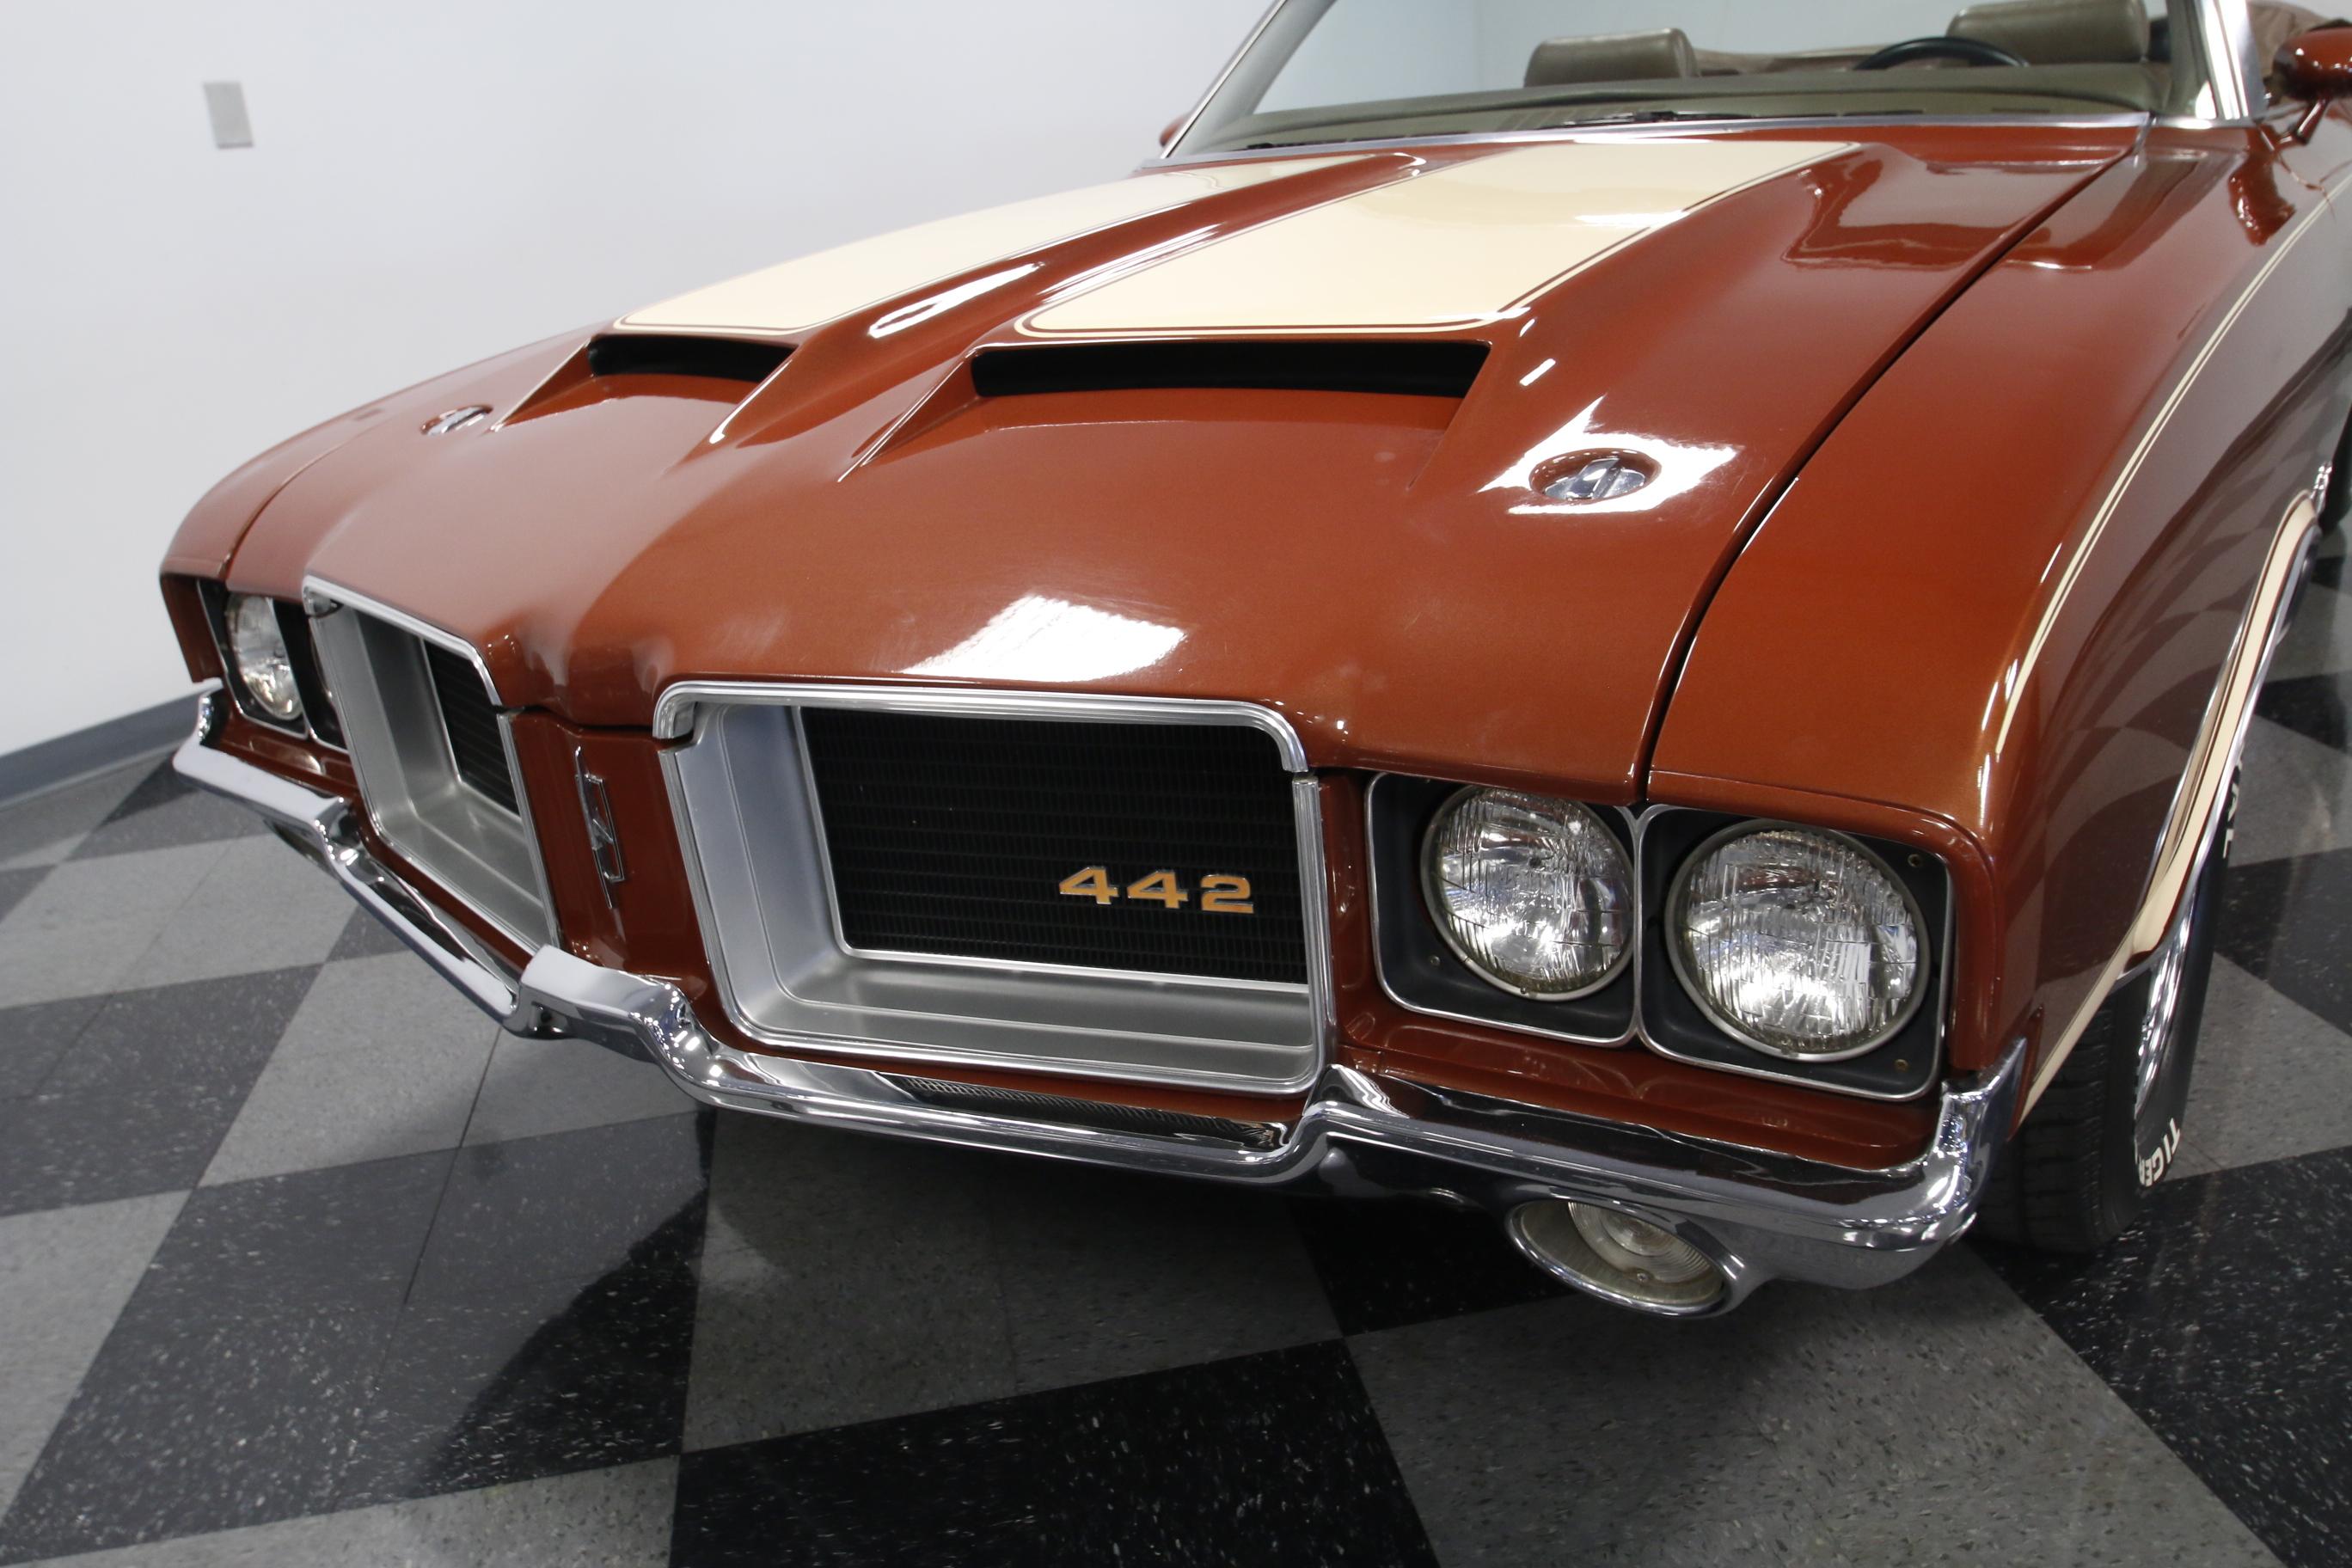 2000 Camaro Speedometer Wiring Diagram Not Lossing 1995 Bcm Oldsmobile Cutl Supreme Engine 1970 Body Control Module Pinout